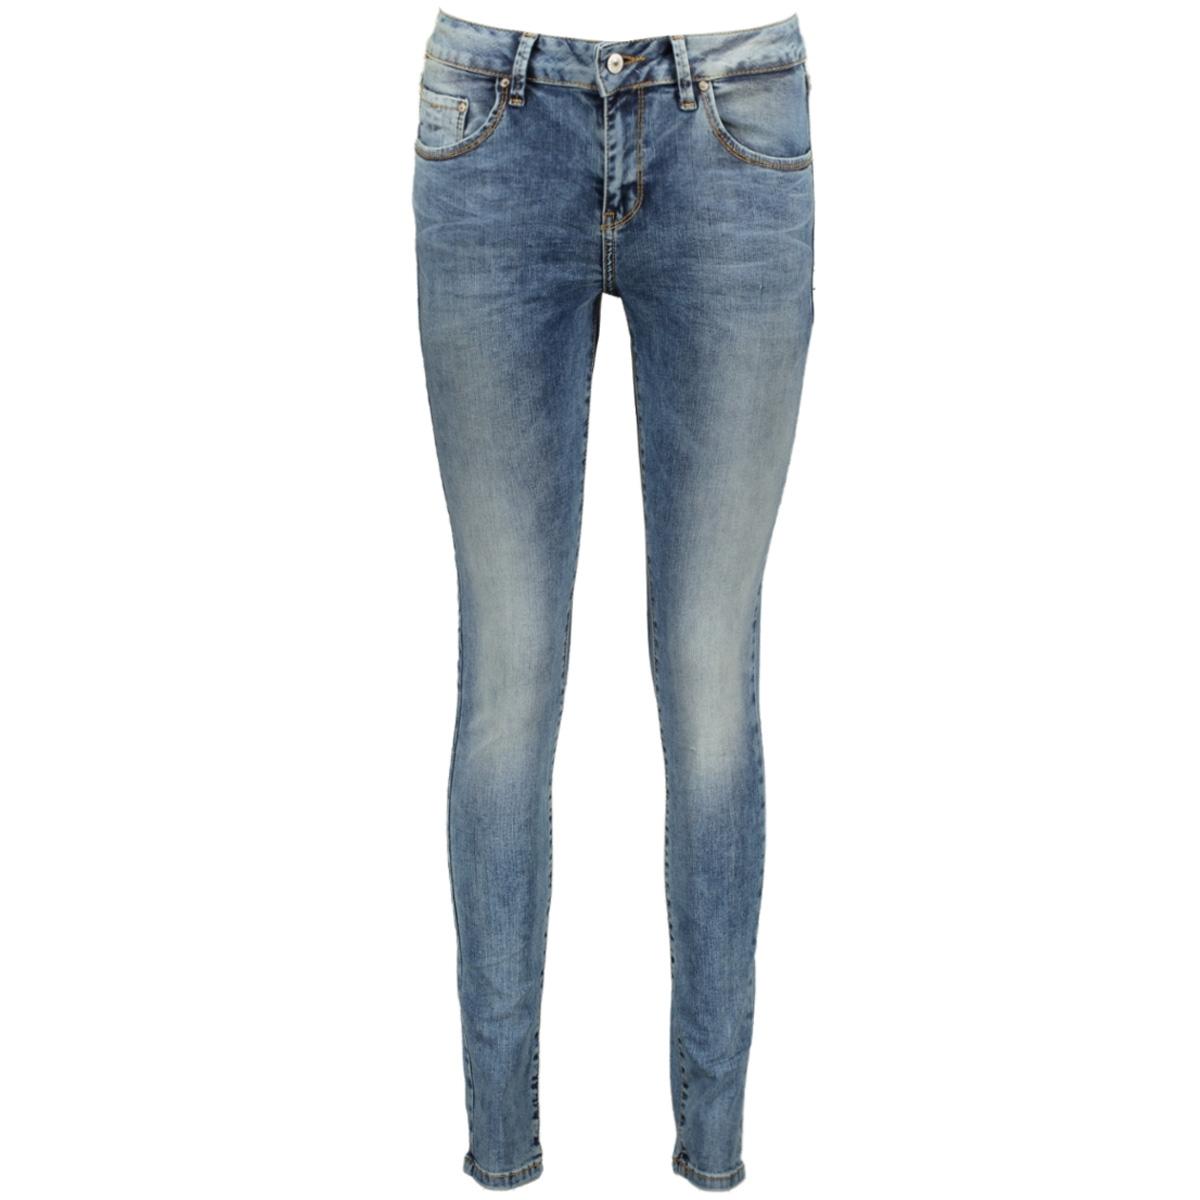 100951169.14469 daisy ltb jeans arleta undamaged wash 51617